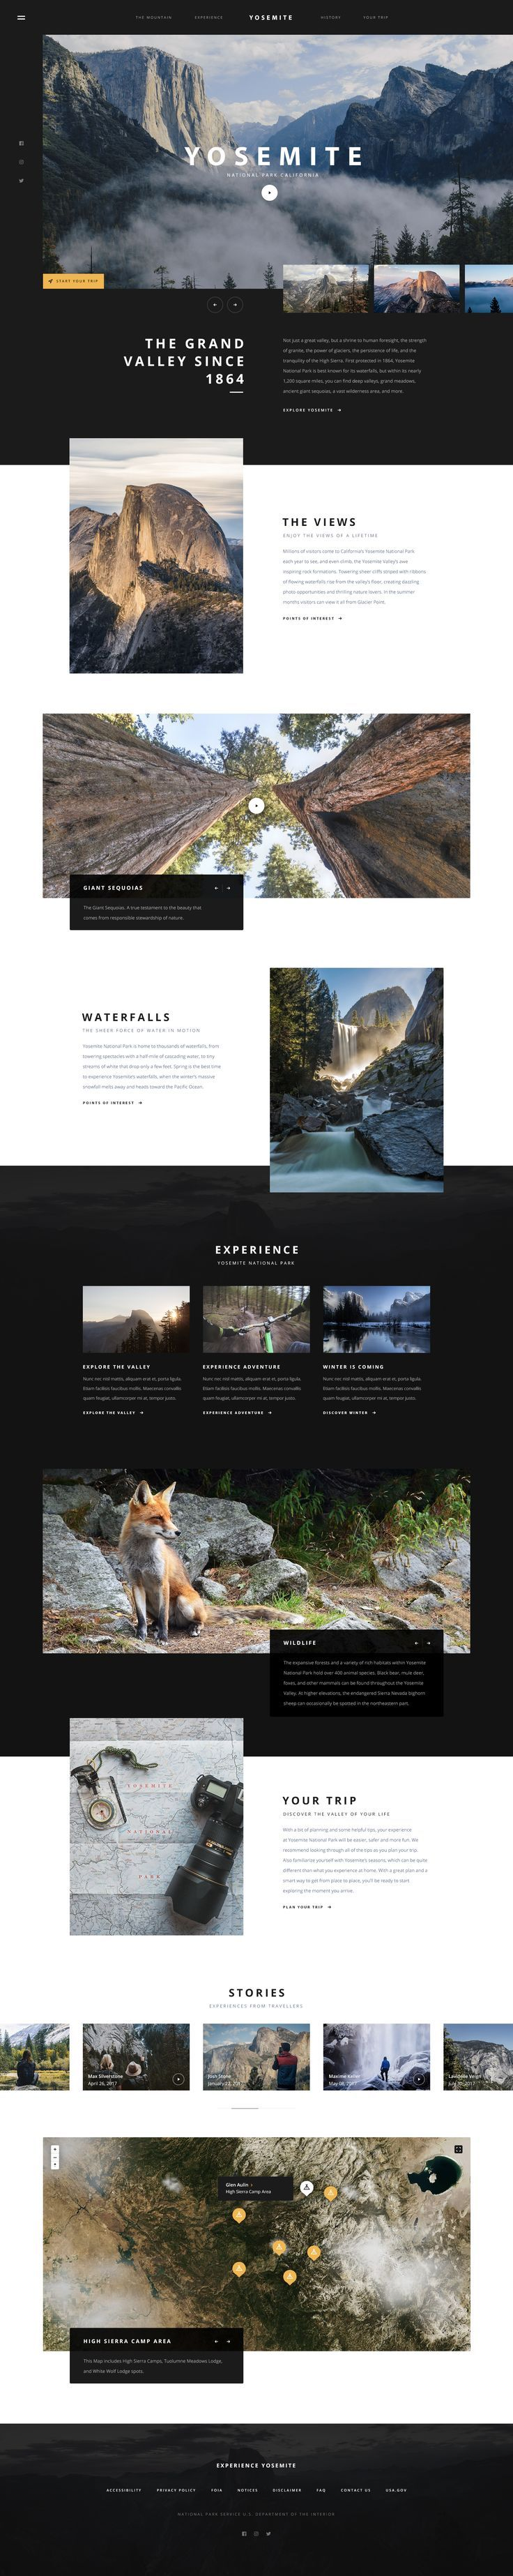 Weblayout design inspiration